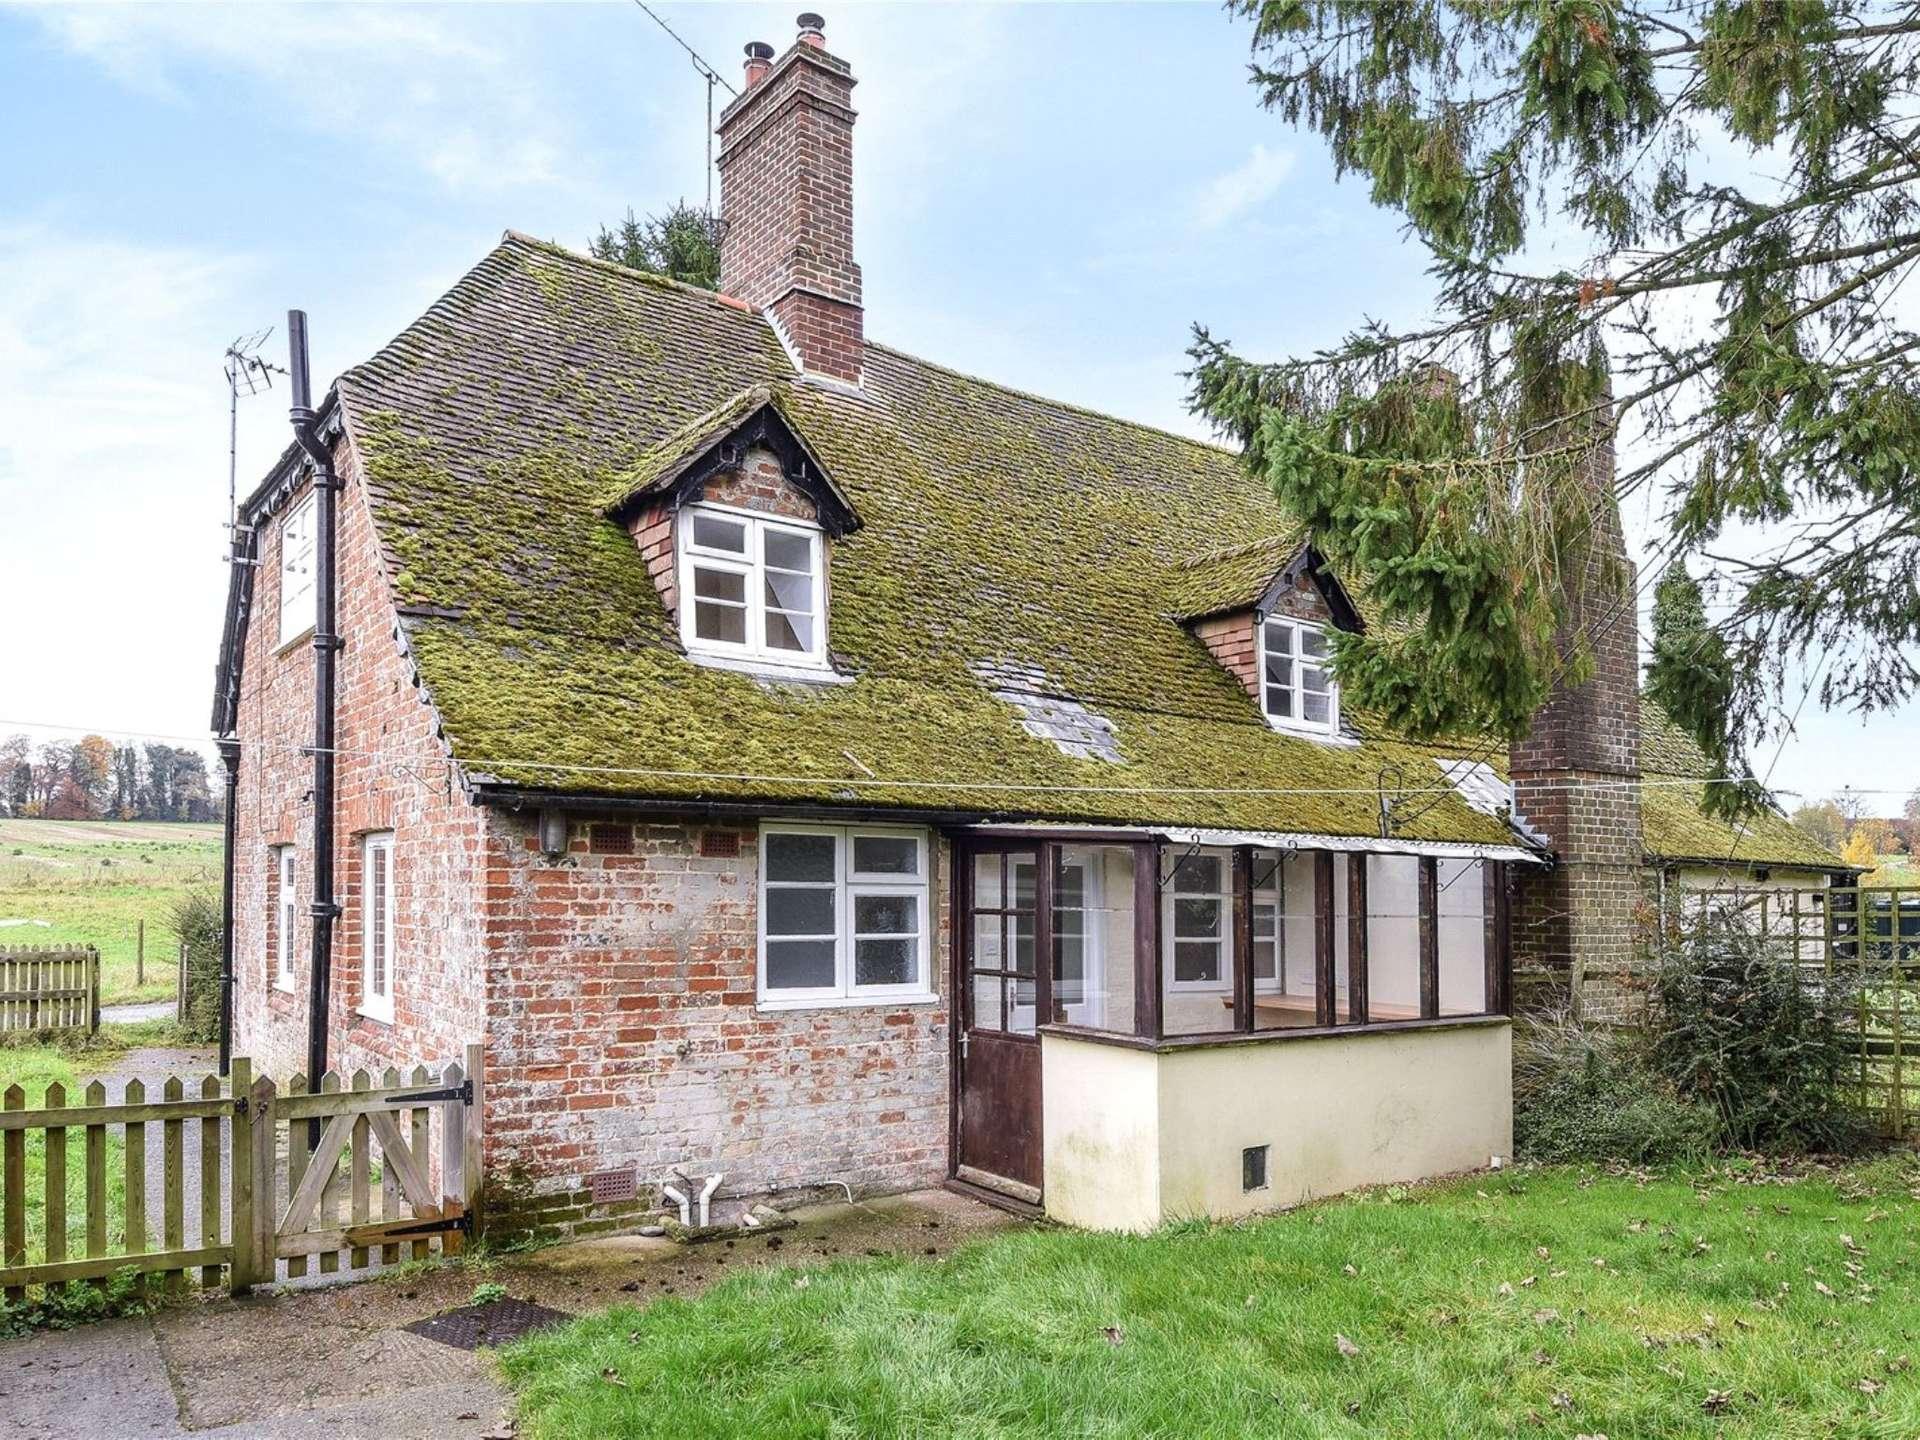 cottages sale in near exterior scotland oakley for cottage old inzievar a ref dunfermline sbbj